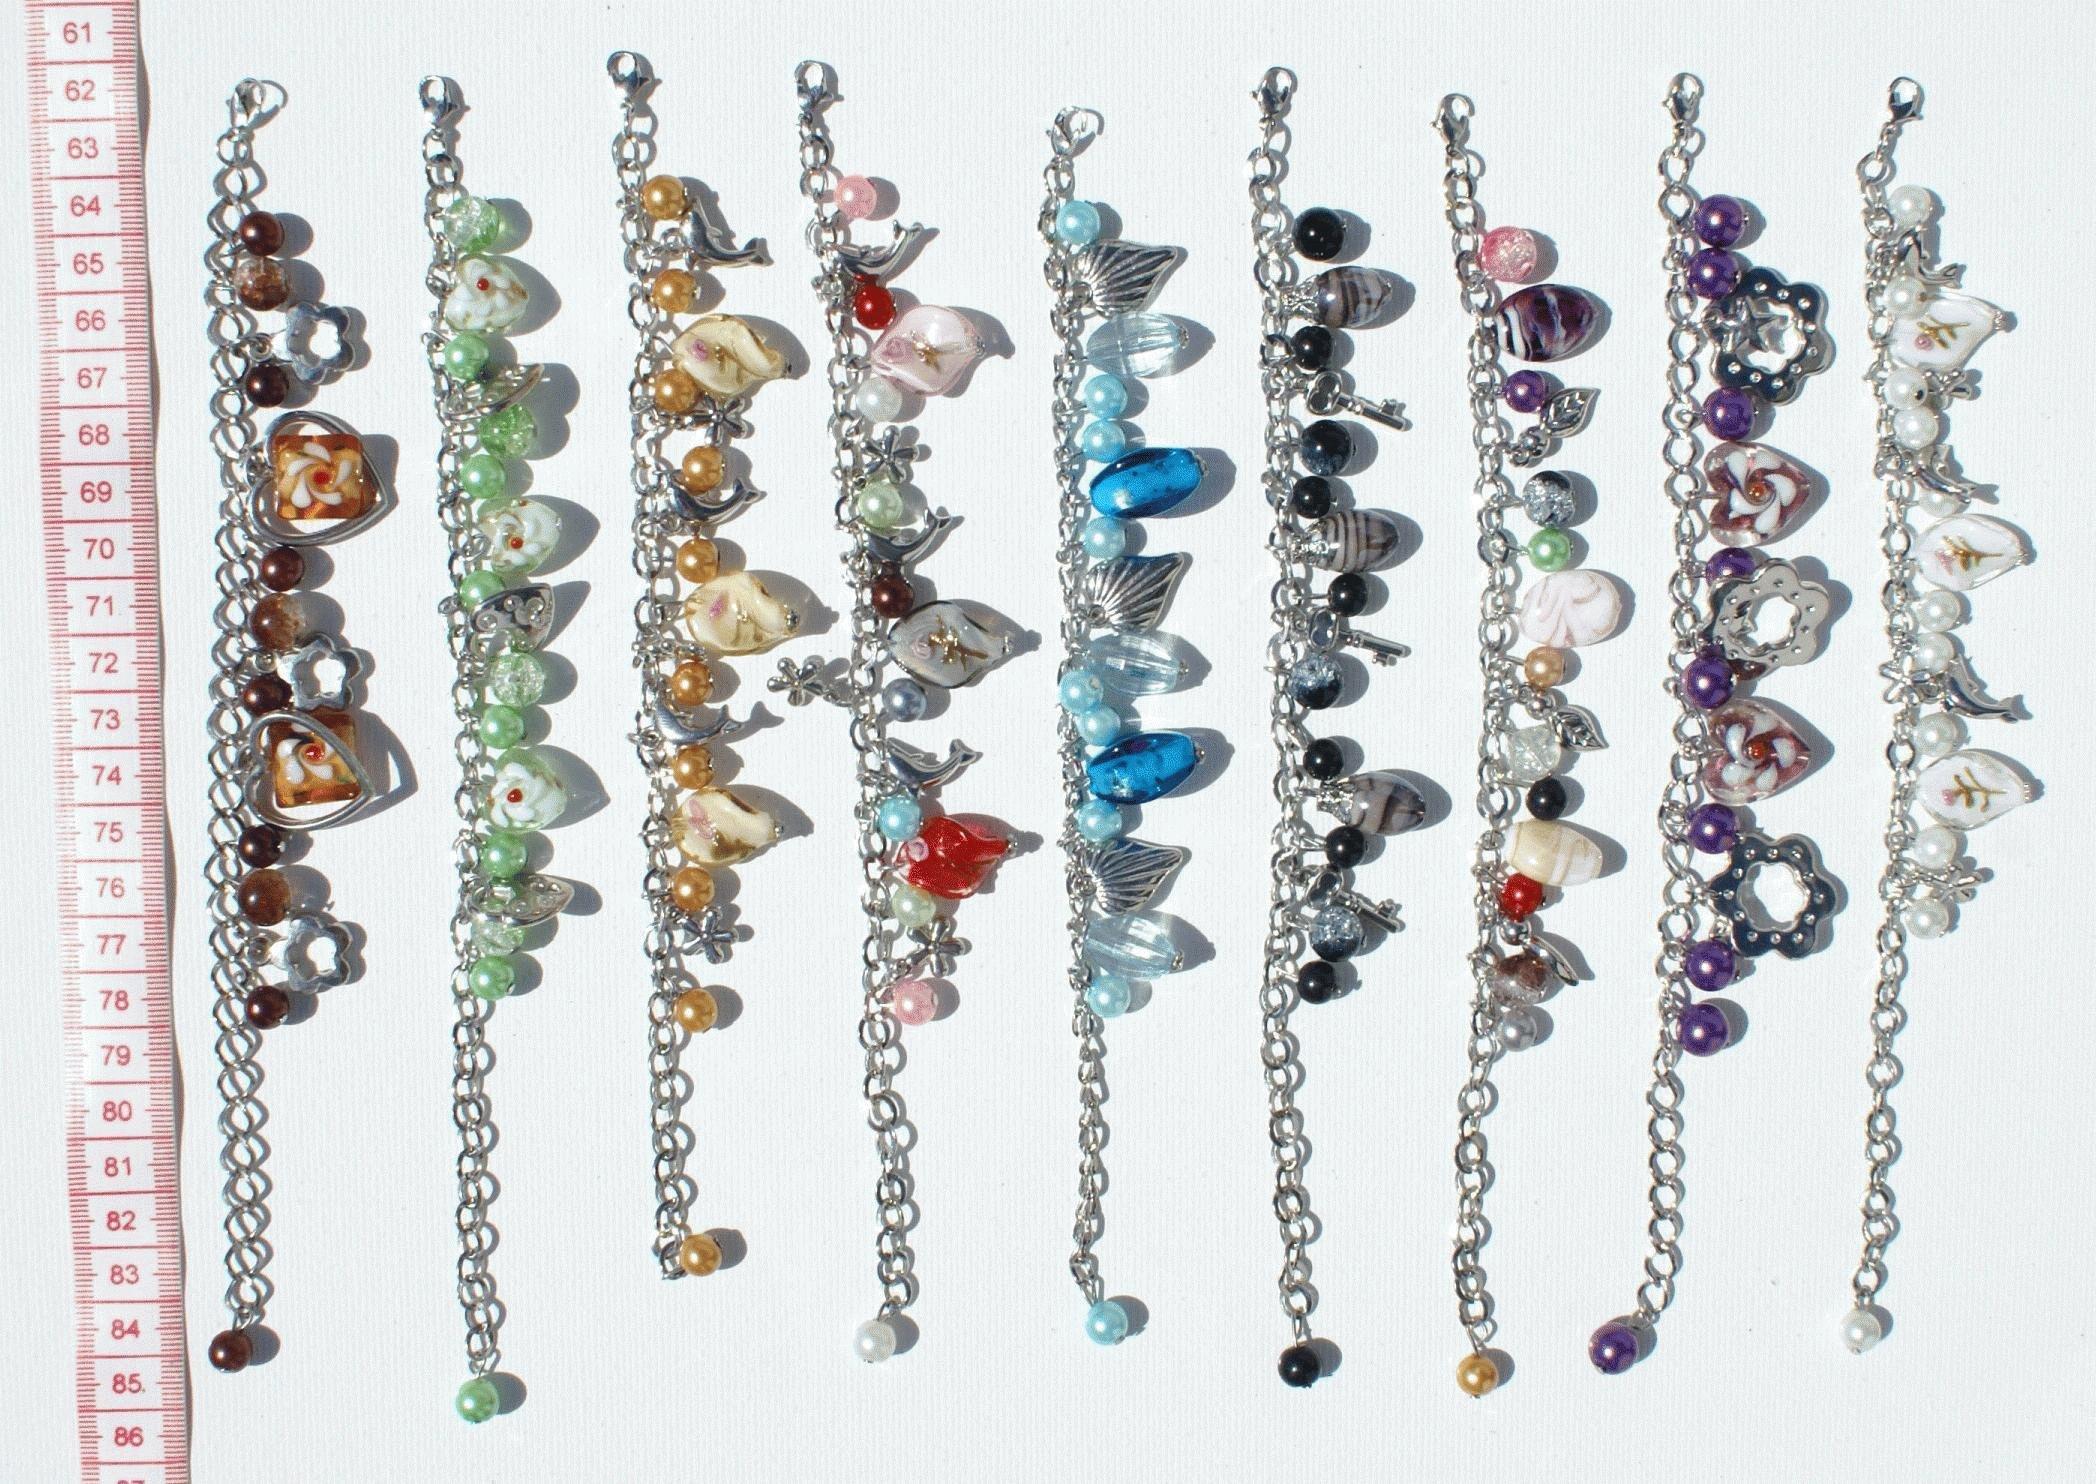 b2ec7894a7f4 Pulseras de metal con cristales de diferentes colores